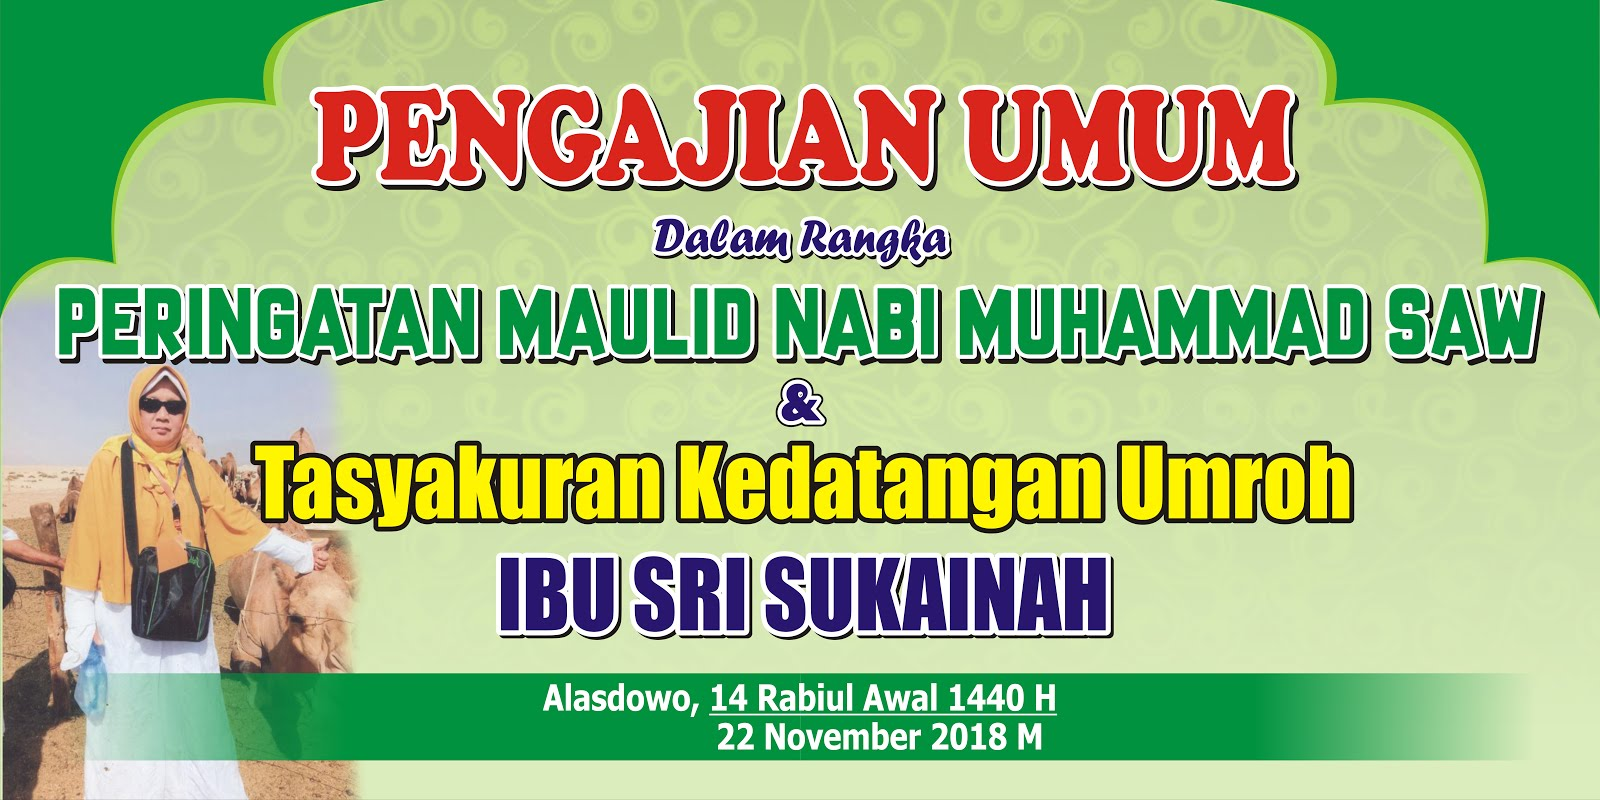 Banner Pengajian Umum Peringatan Maulid Nabi Muhammad Saw H Tasyakuran Kedatangan Umroh